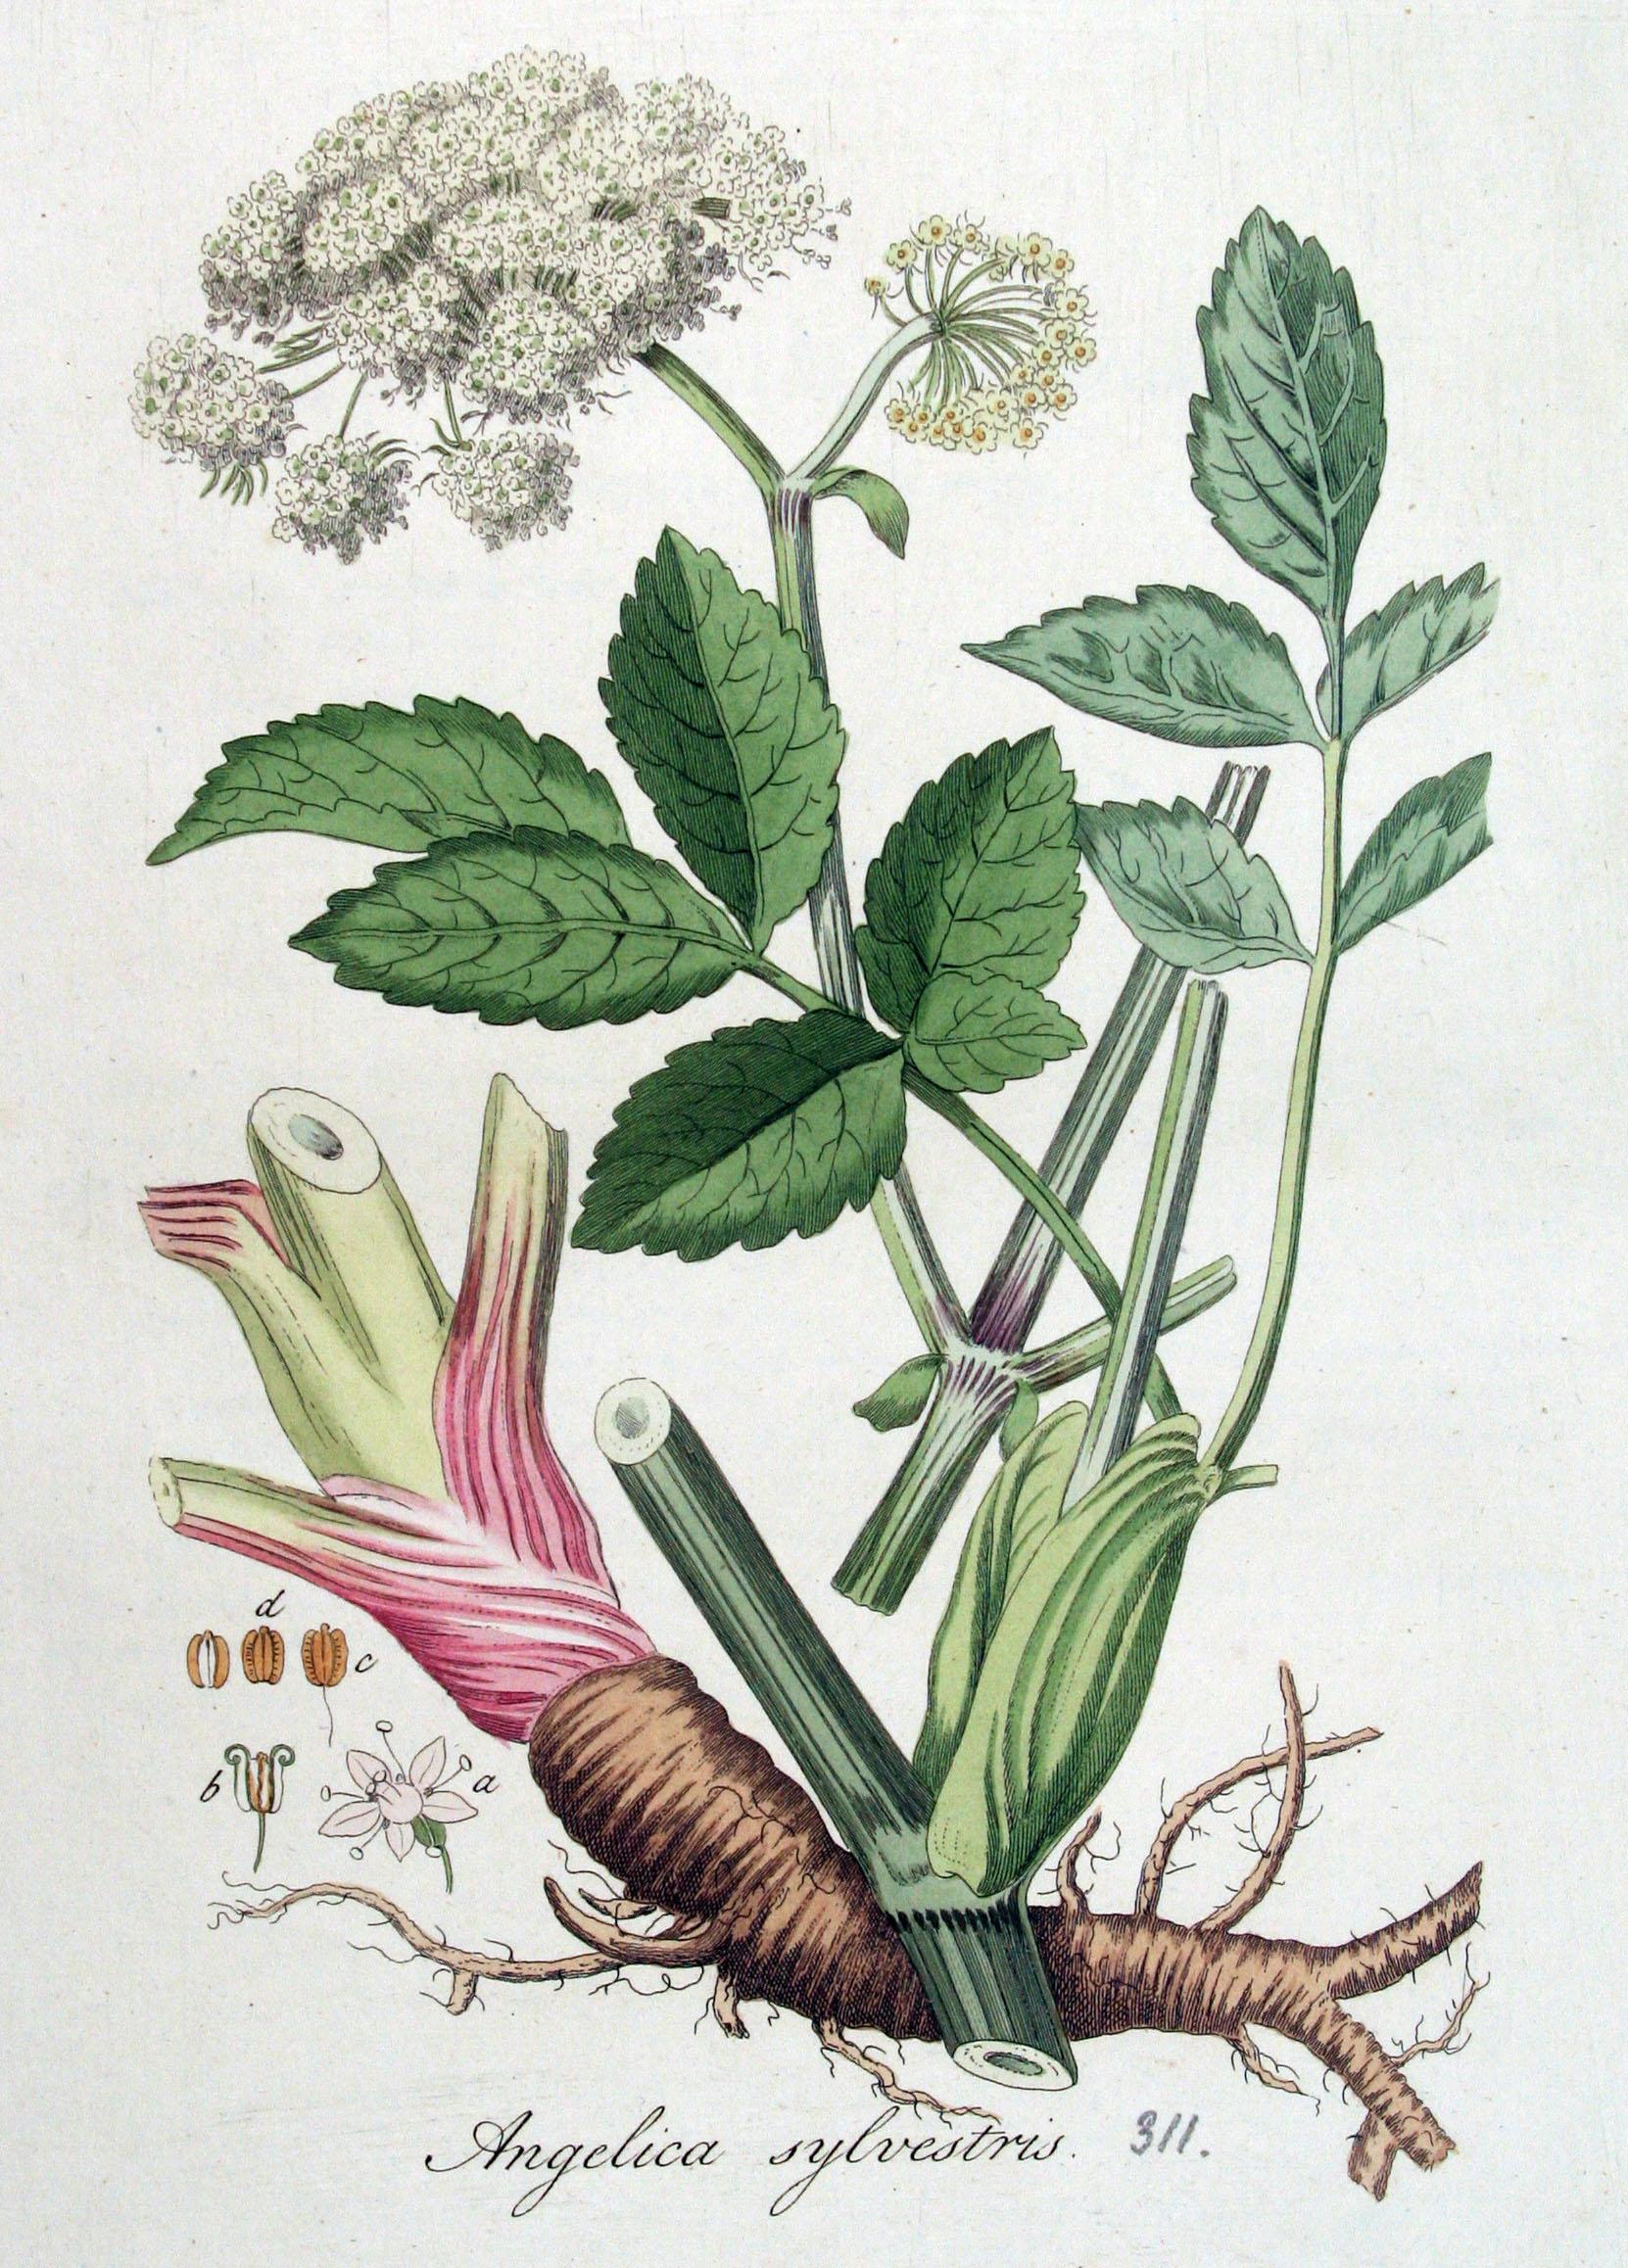 https://upload.wikimedia.org/wikipedia/commons/a/ac/Angelica_sylvestris_%E2%80%94_Flora_Batava_%E2%80%94_Volume_v4.jpg